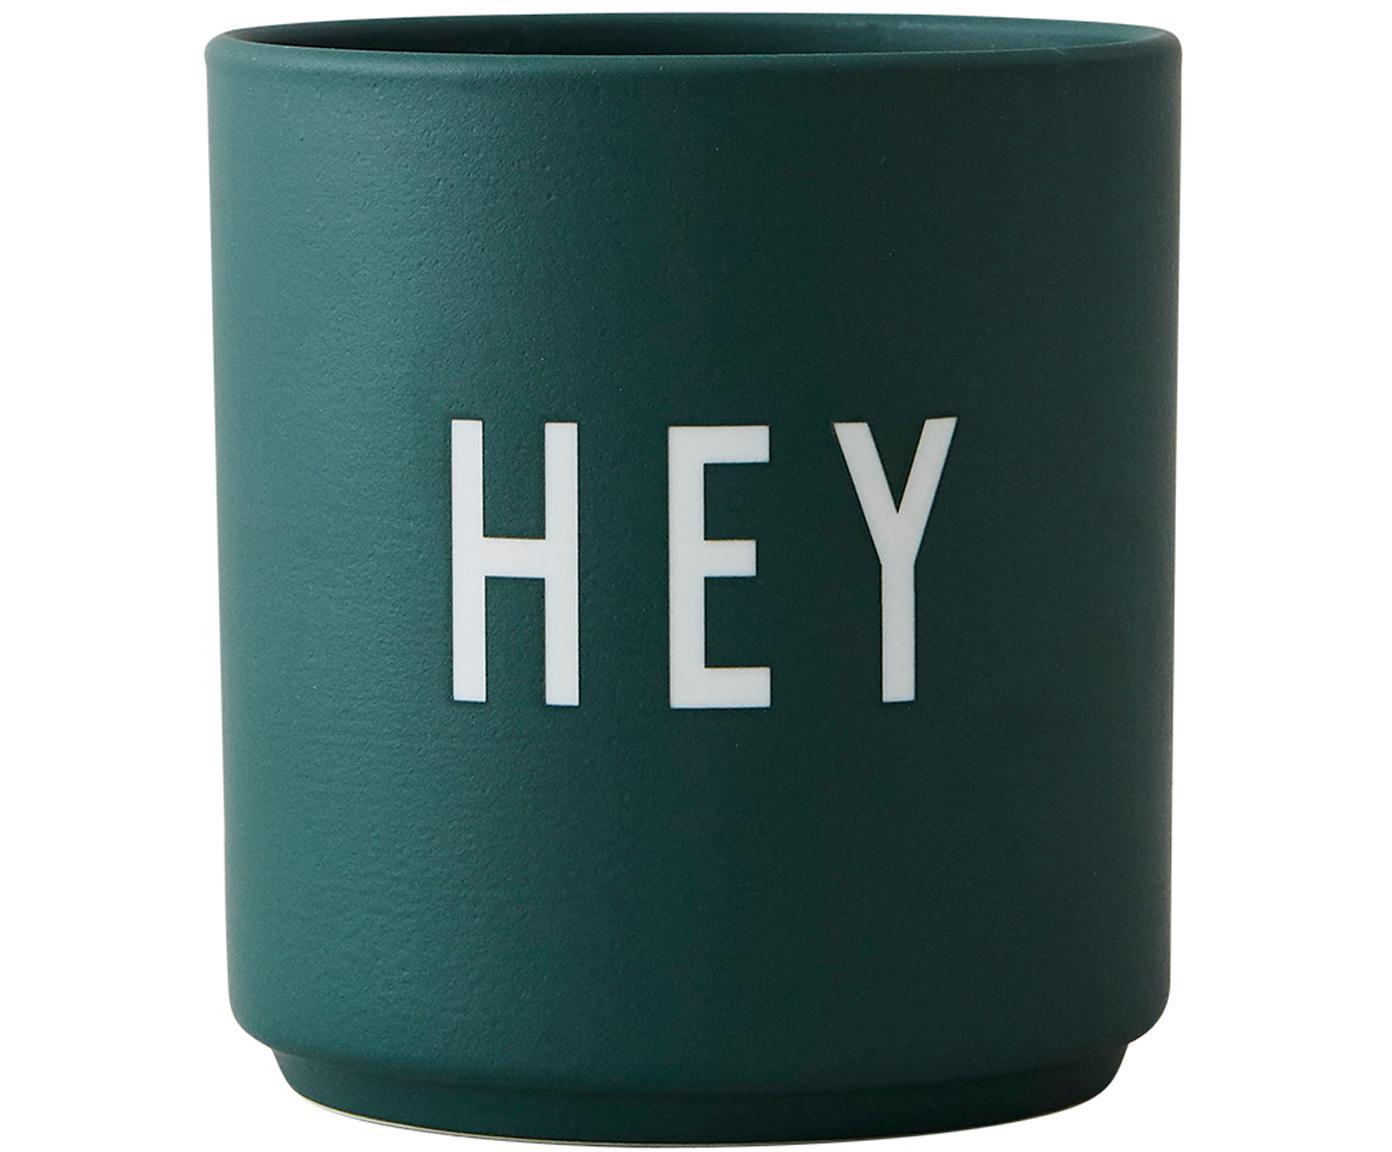 Design Becher Favourite HEY in Grün mit Schriftzug, Fine Bone China (Porzellan), Dunkelgrün, Ø 8 x H 9 cm